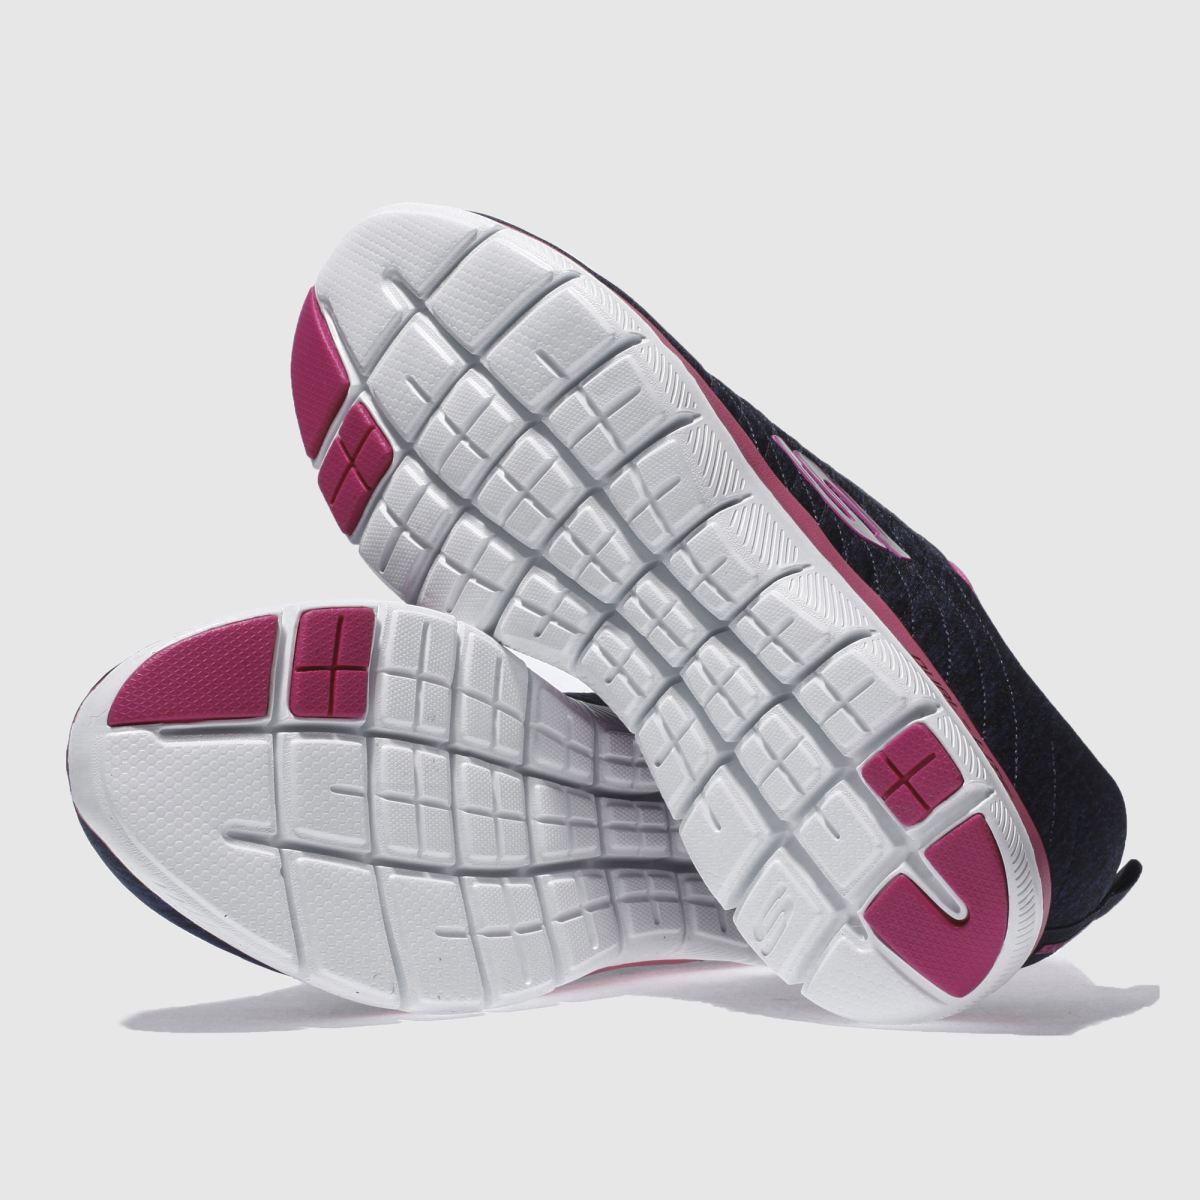 Damen Marineblau-weiß Gute skechers Flex Appeal 2-0 Sneaker | schuh Gute Marineblau-weiß Qualität beliebte Schuhe 7d5c10